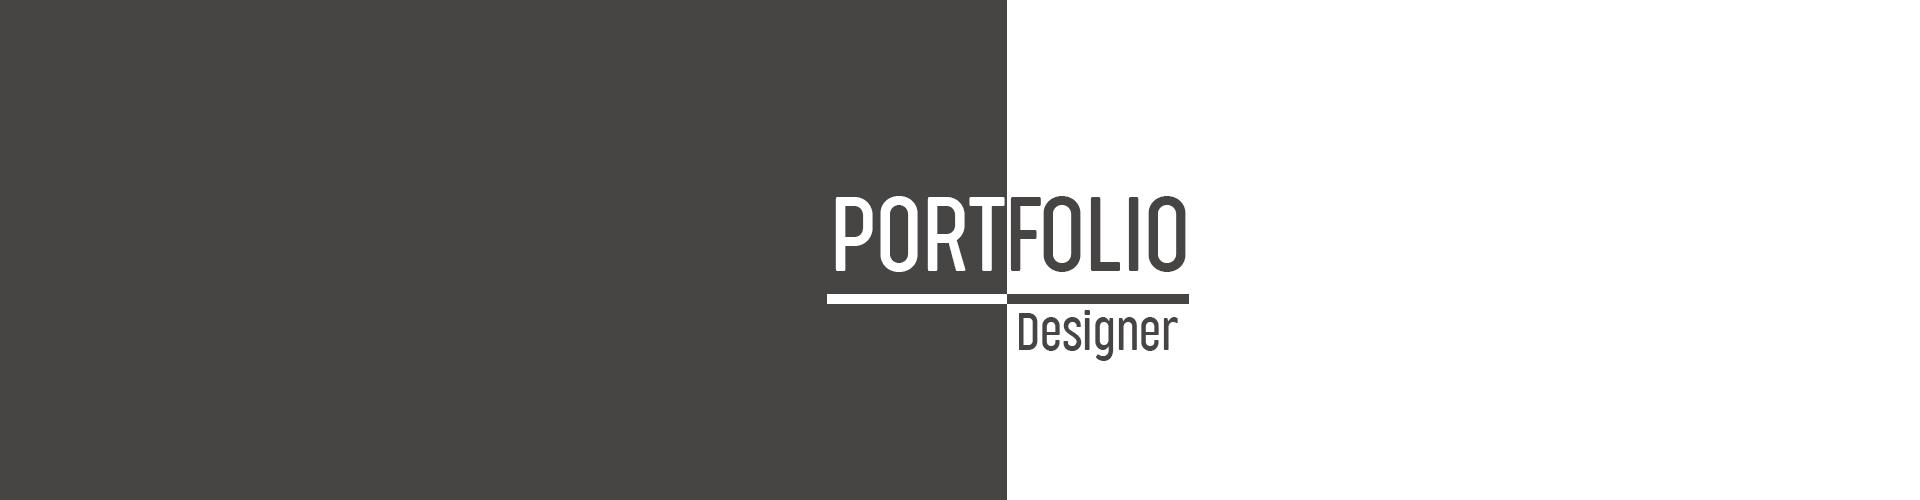 portfolio felice avella programming